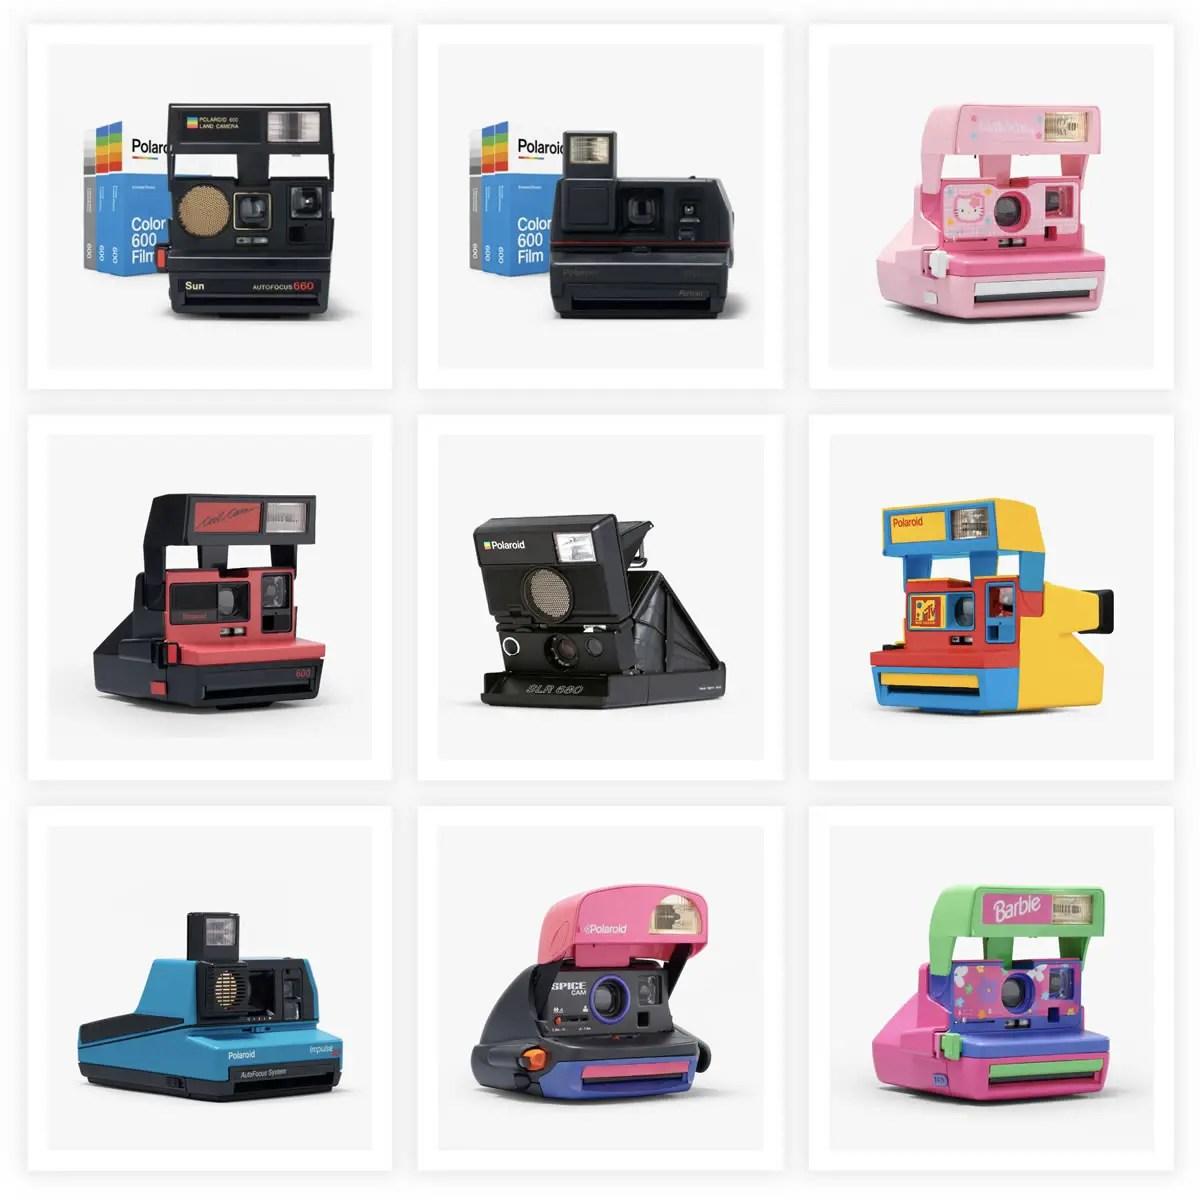 Polaroid 600 cameras. Credit: Polaroid.com